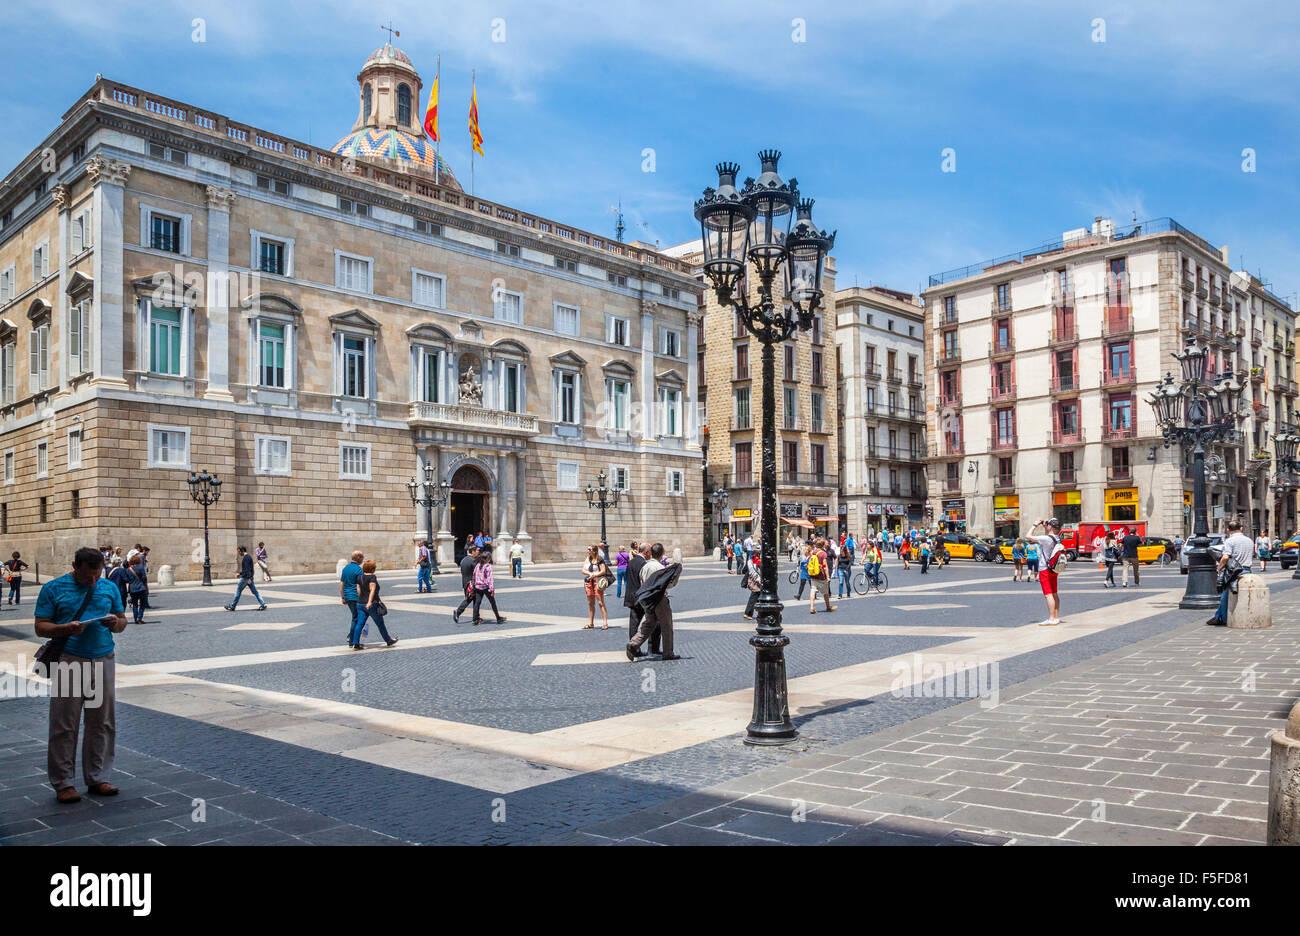 España, Cataluña, Barcelona, Ciutat Vella, Barri Gòtic, El Palacio de la Generalitat de Cataluña Imagen De Stock